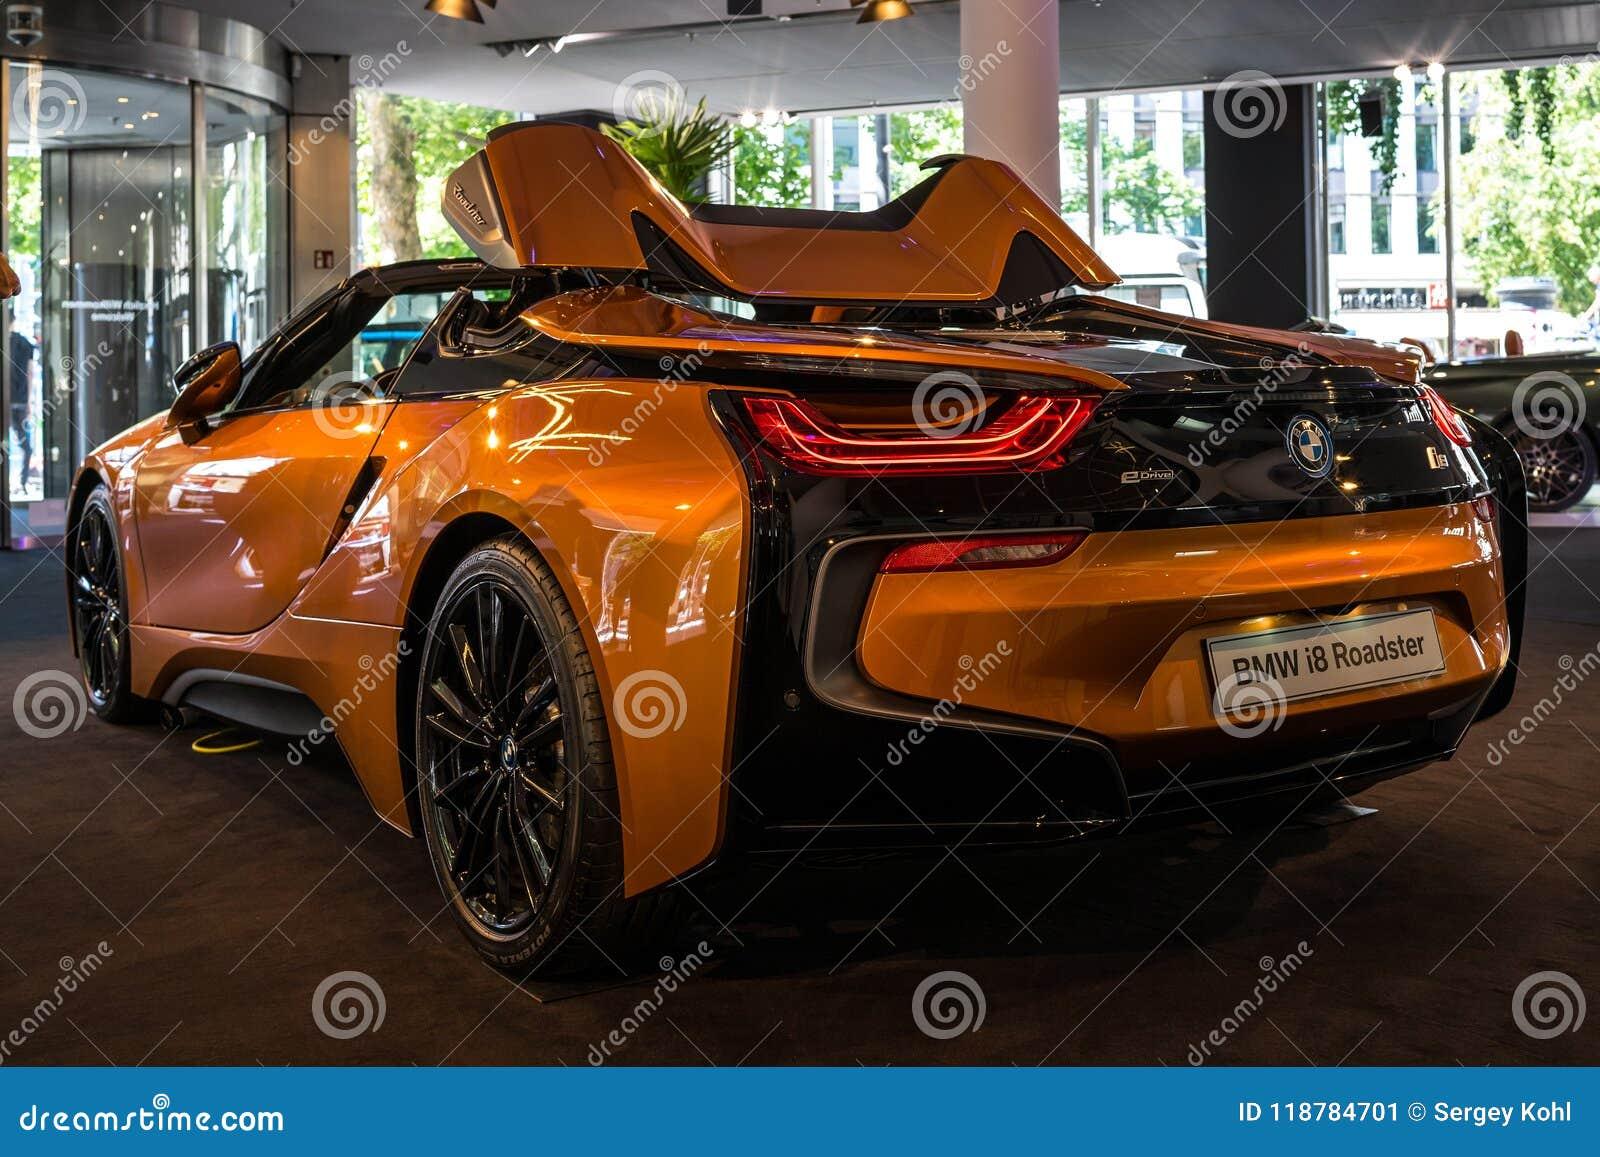 A Plug In Hybrid Sports Car Bmw I8 Roadster Editorial Photo Image Of Automotive Orange 118784701